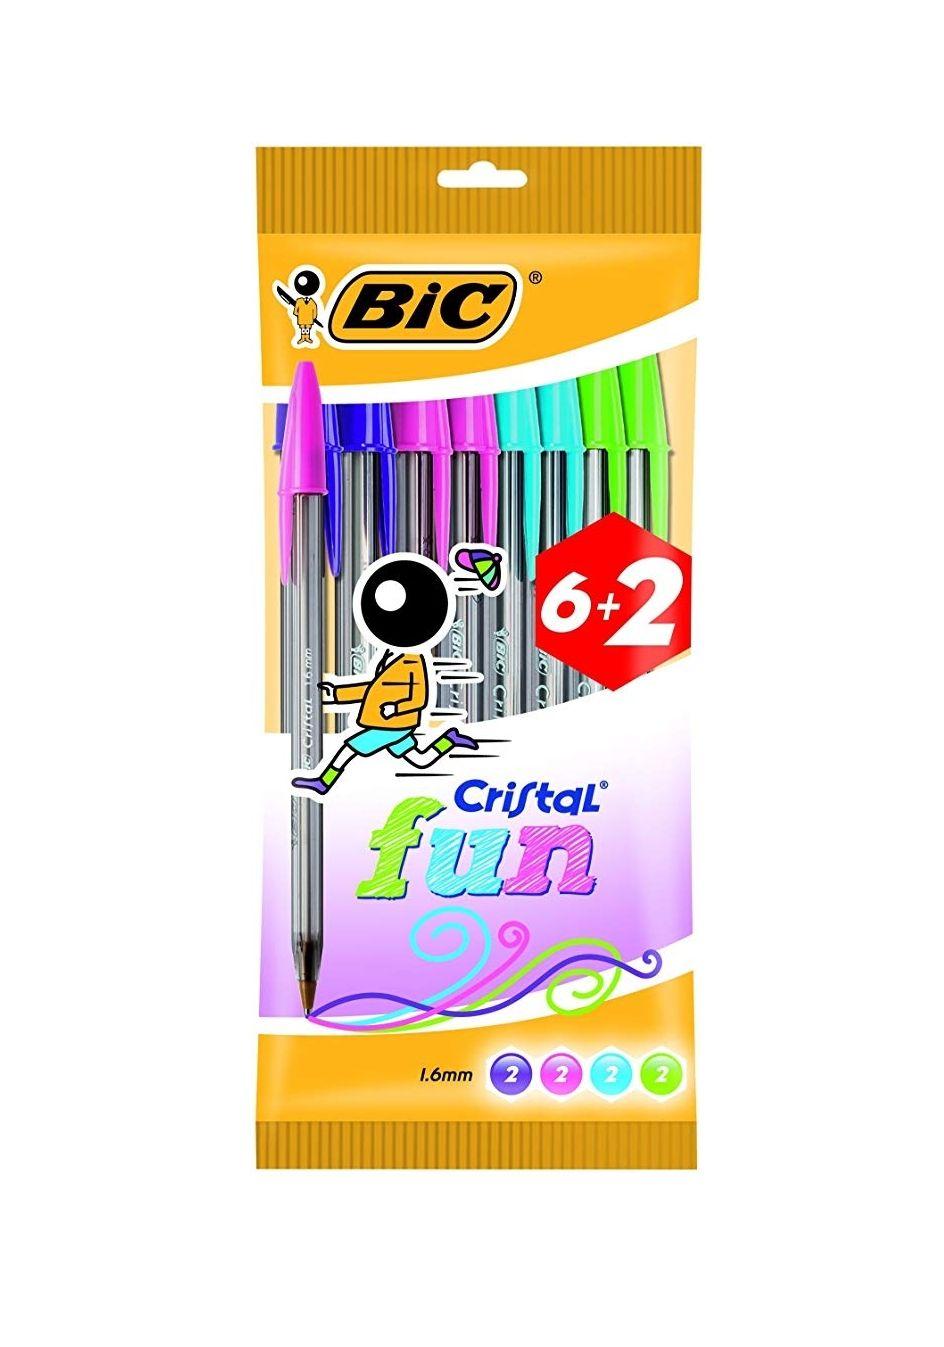 Bolígrafos BIC Cristal colores por 1.76€ [PLUS]